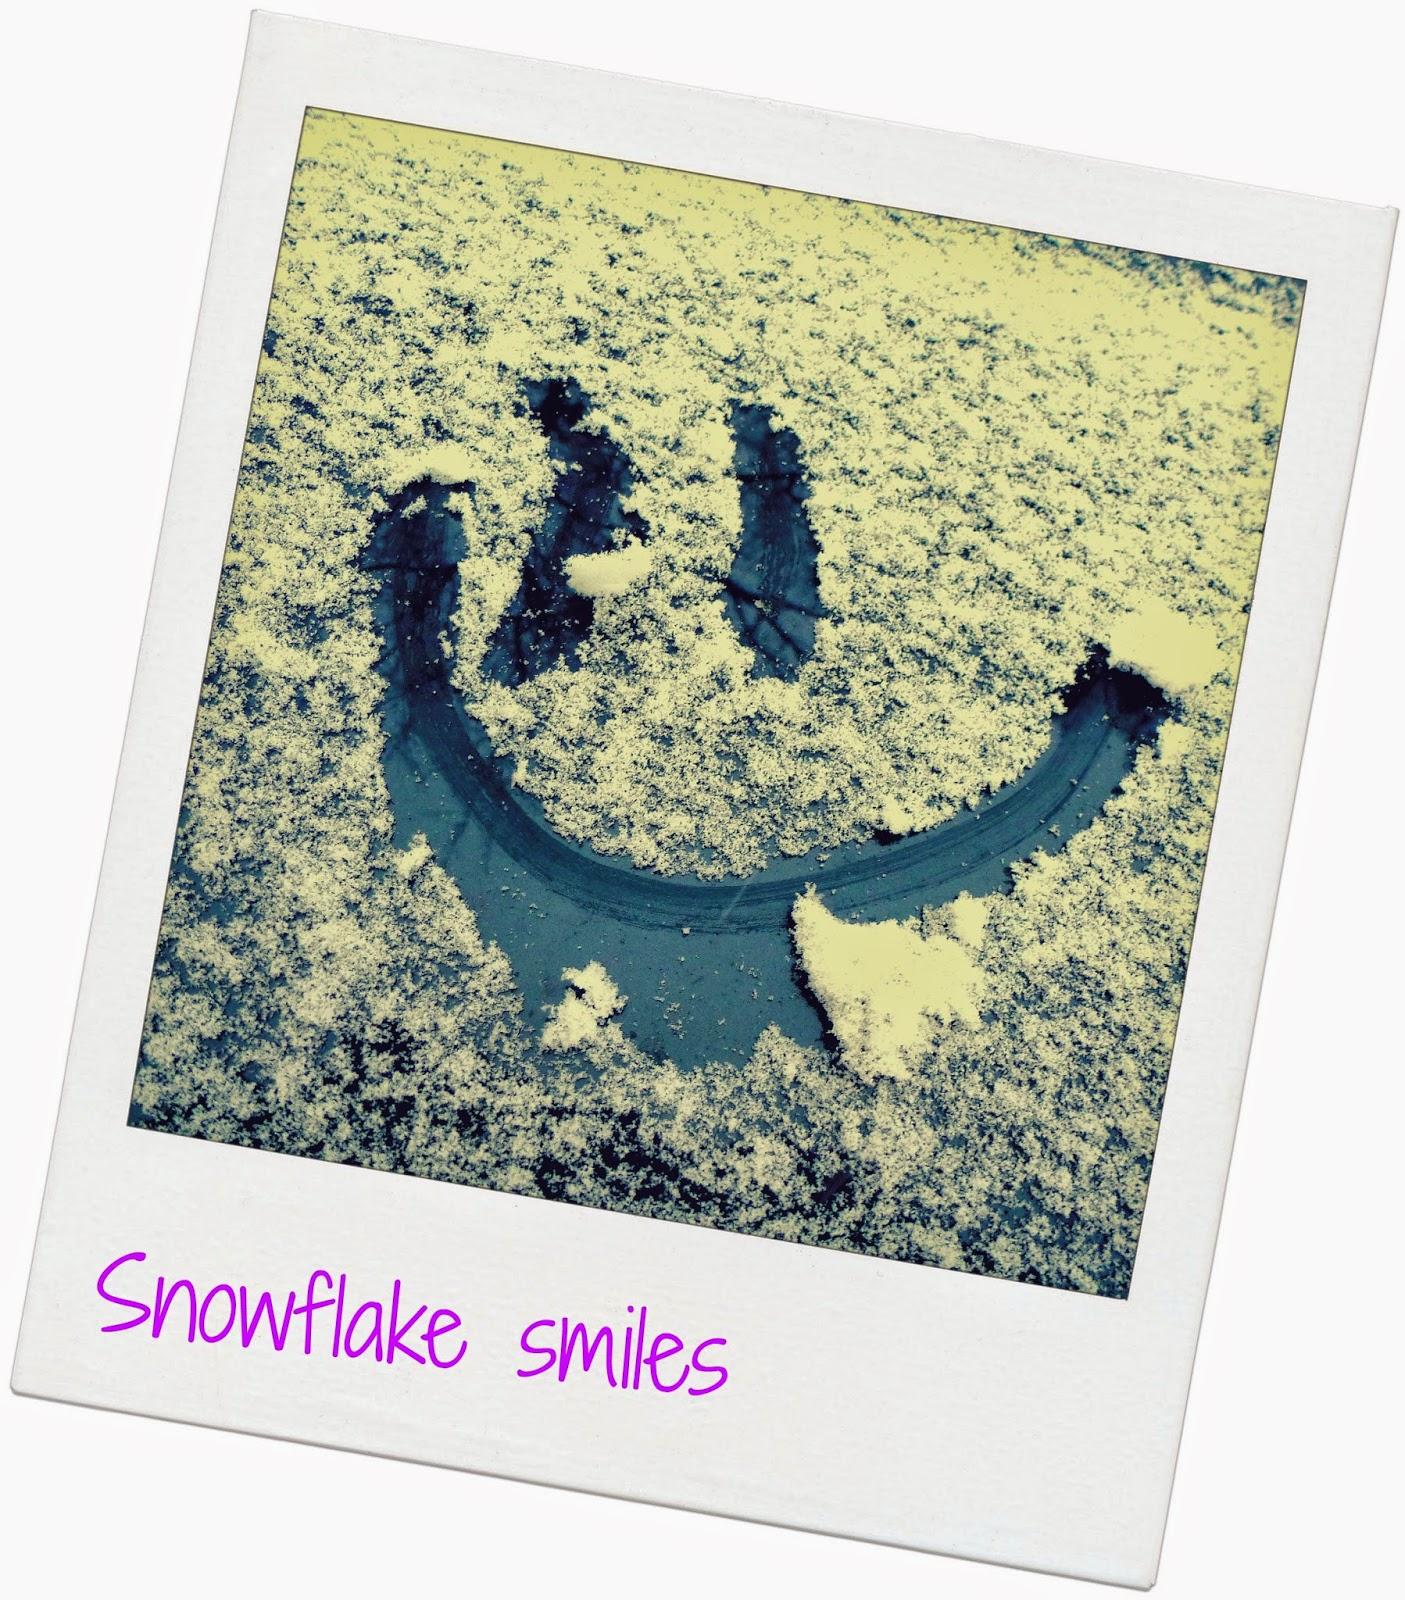 snowflake smiles love snow from MommysPinkieLipgloss.blogspot.com